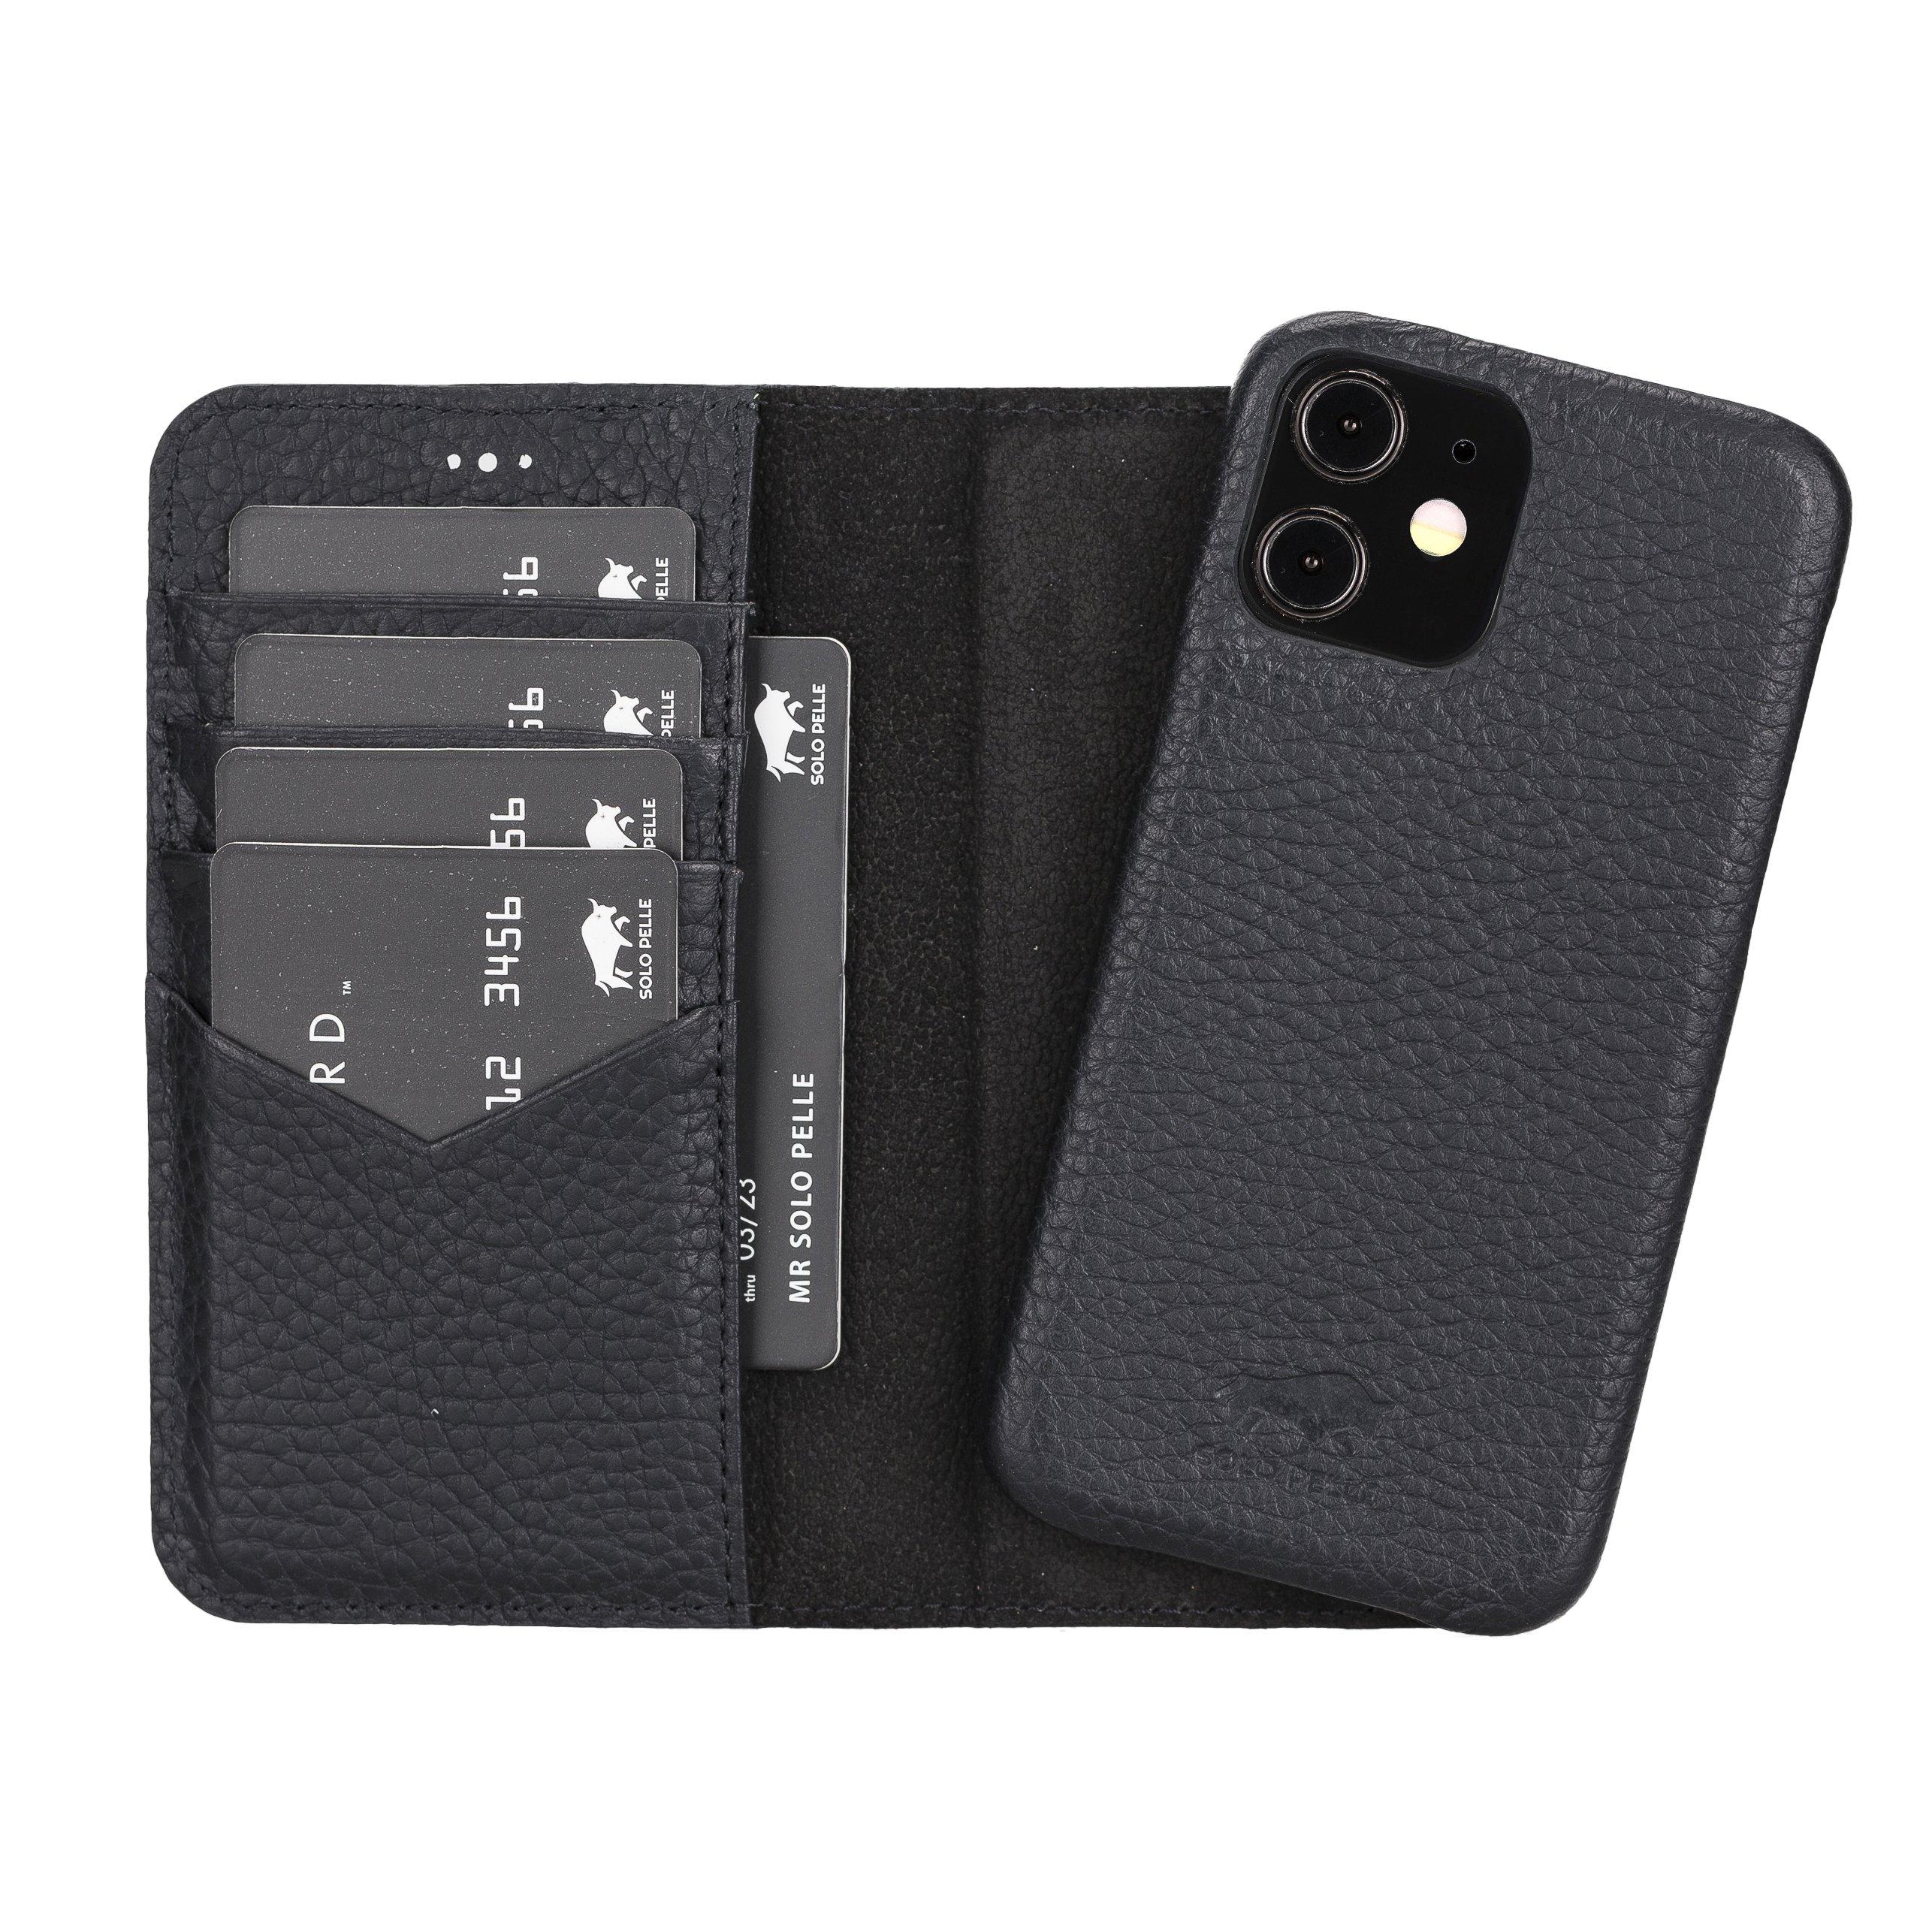 "iPhone 12 Mini abnehmbare Lederhülle ""Clemson"" MagSafe kompatibel (Vollleder Matt Schwarz)"